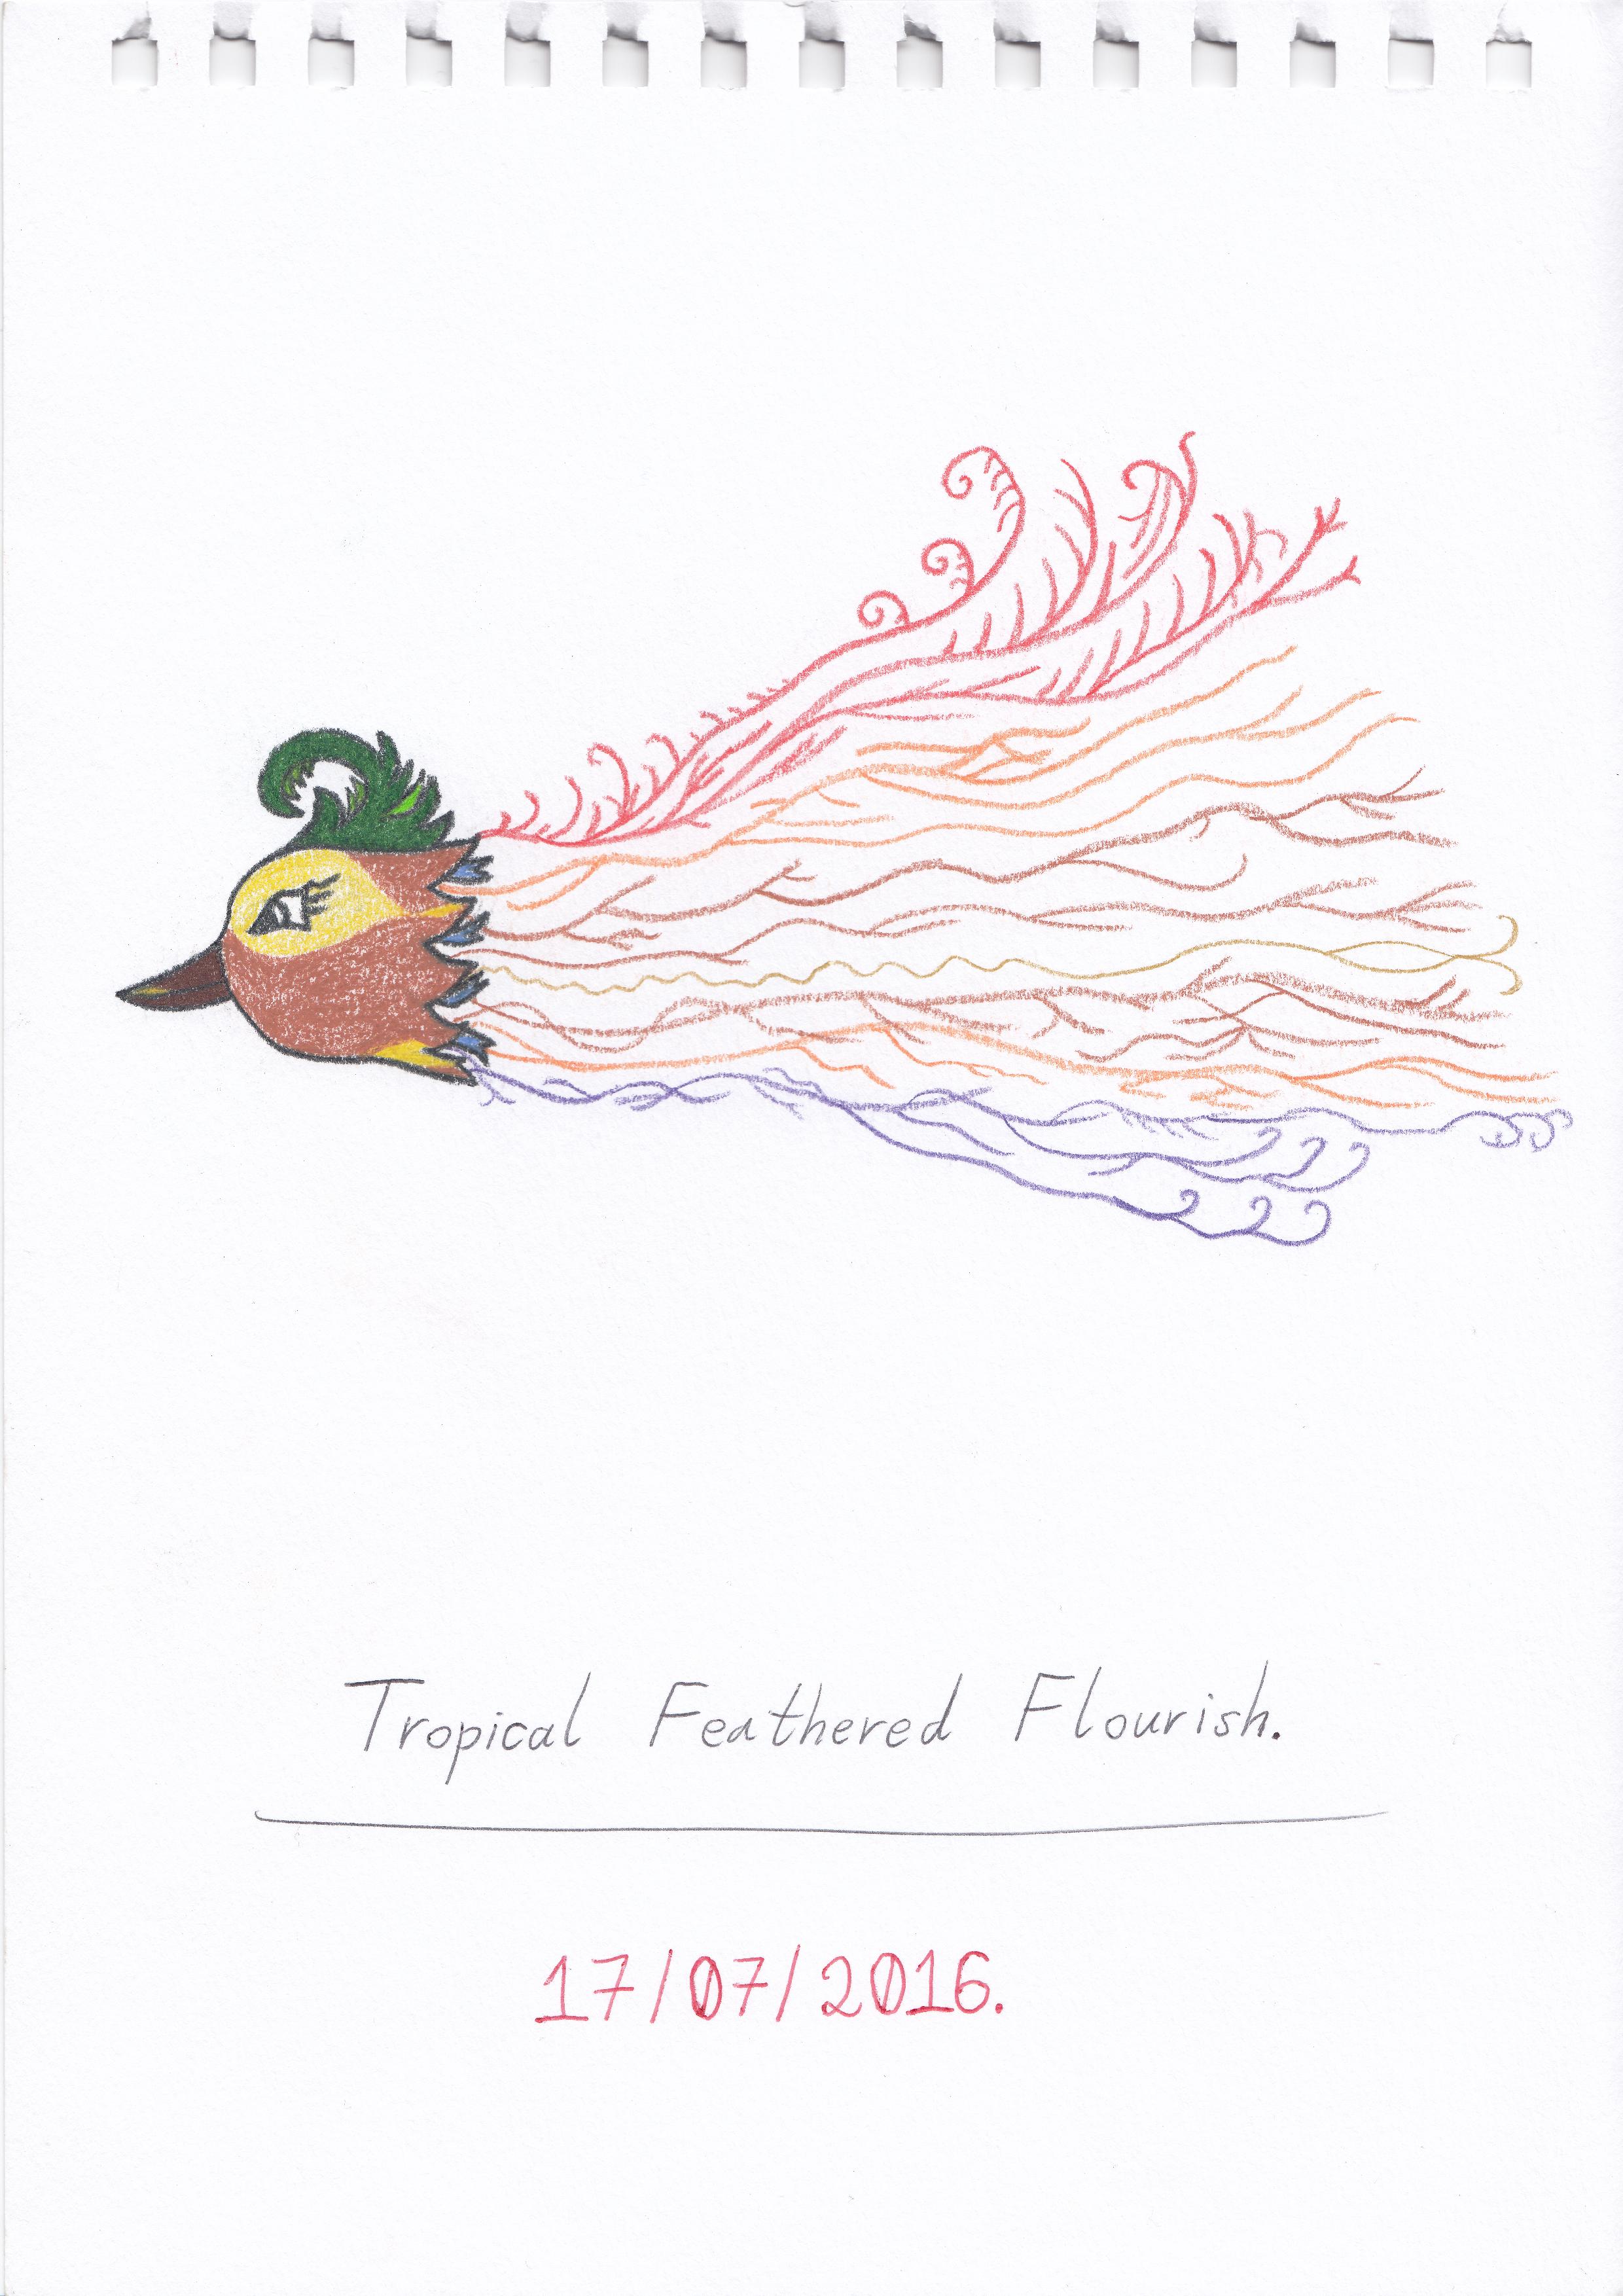 Tropical Feathered Flourish. (17/07/2016)